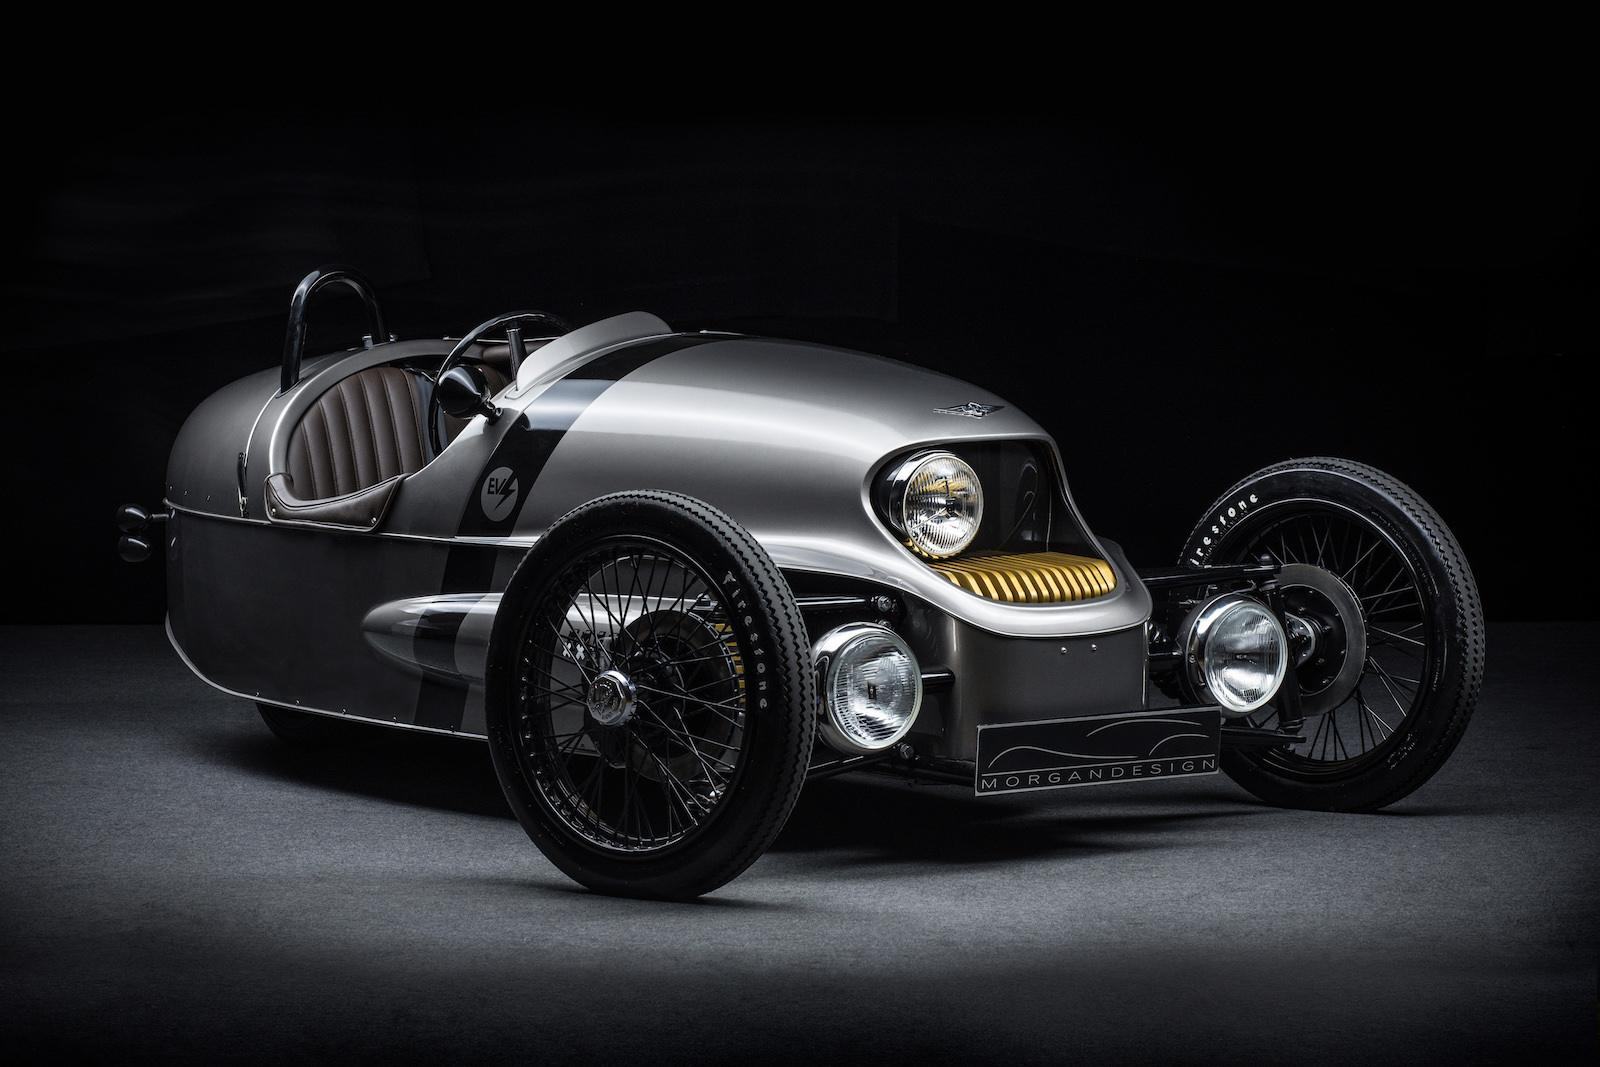 Electric Morgan three-wheeler set for 2018 production